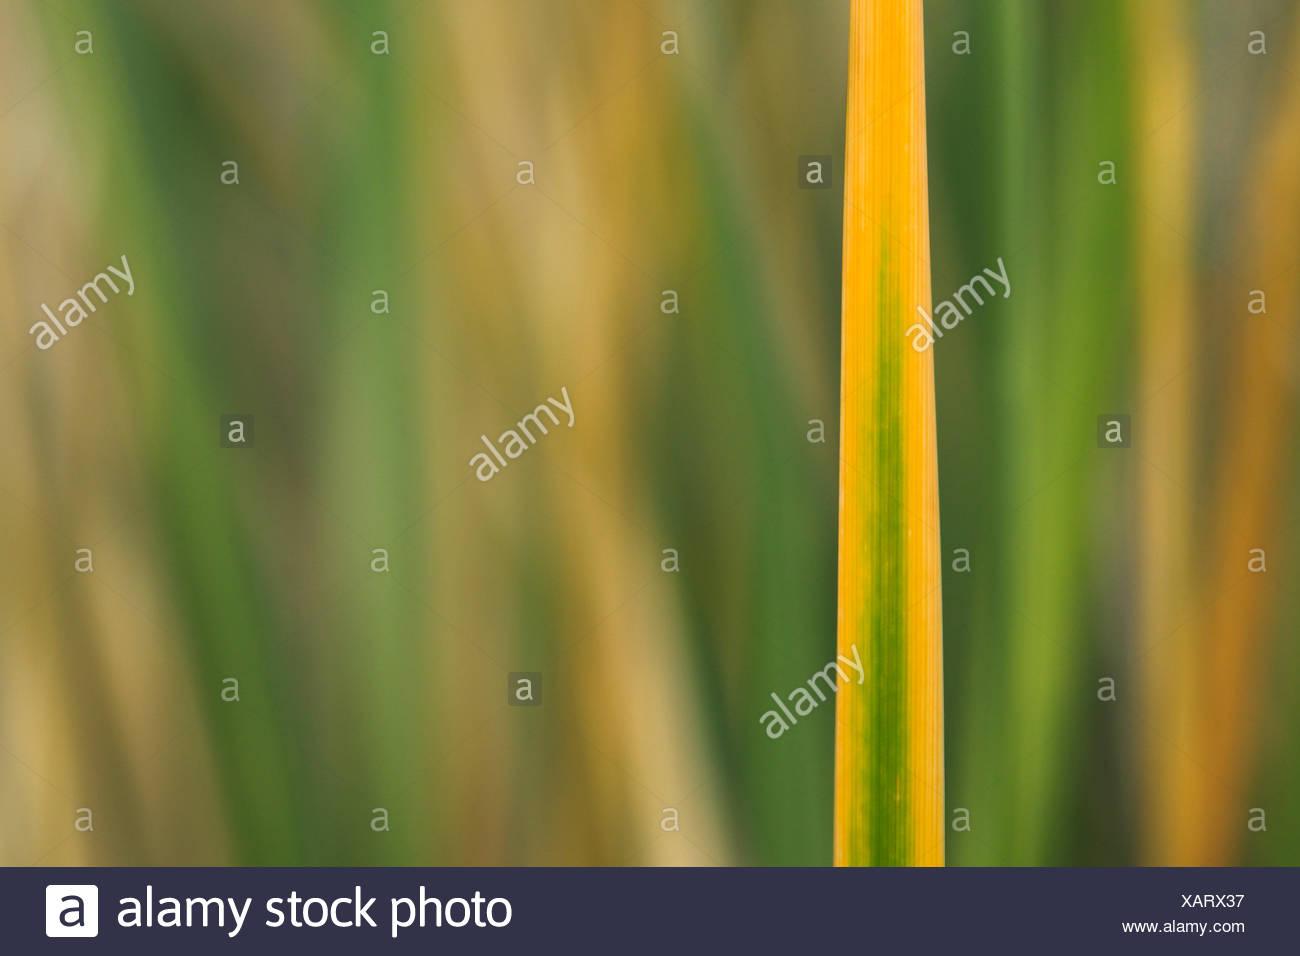 Detail, Germany, Europe, dune, dune grass, blade of grass, Helgoland, coastal vegetation, macro, sea, seashore, pattern, nature, - Stock Image